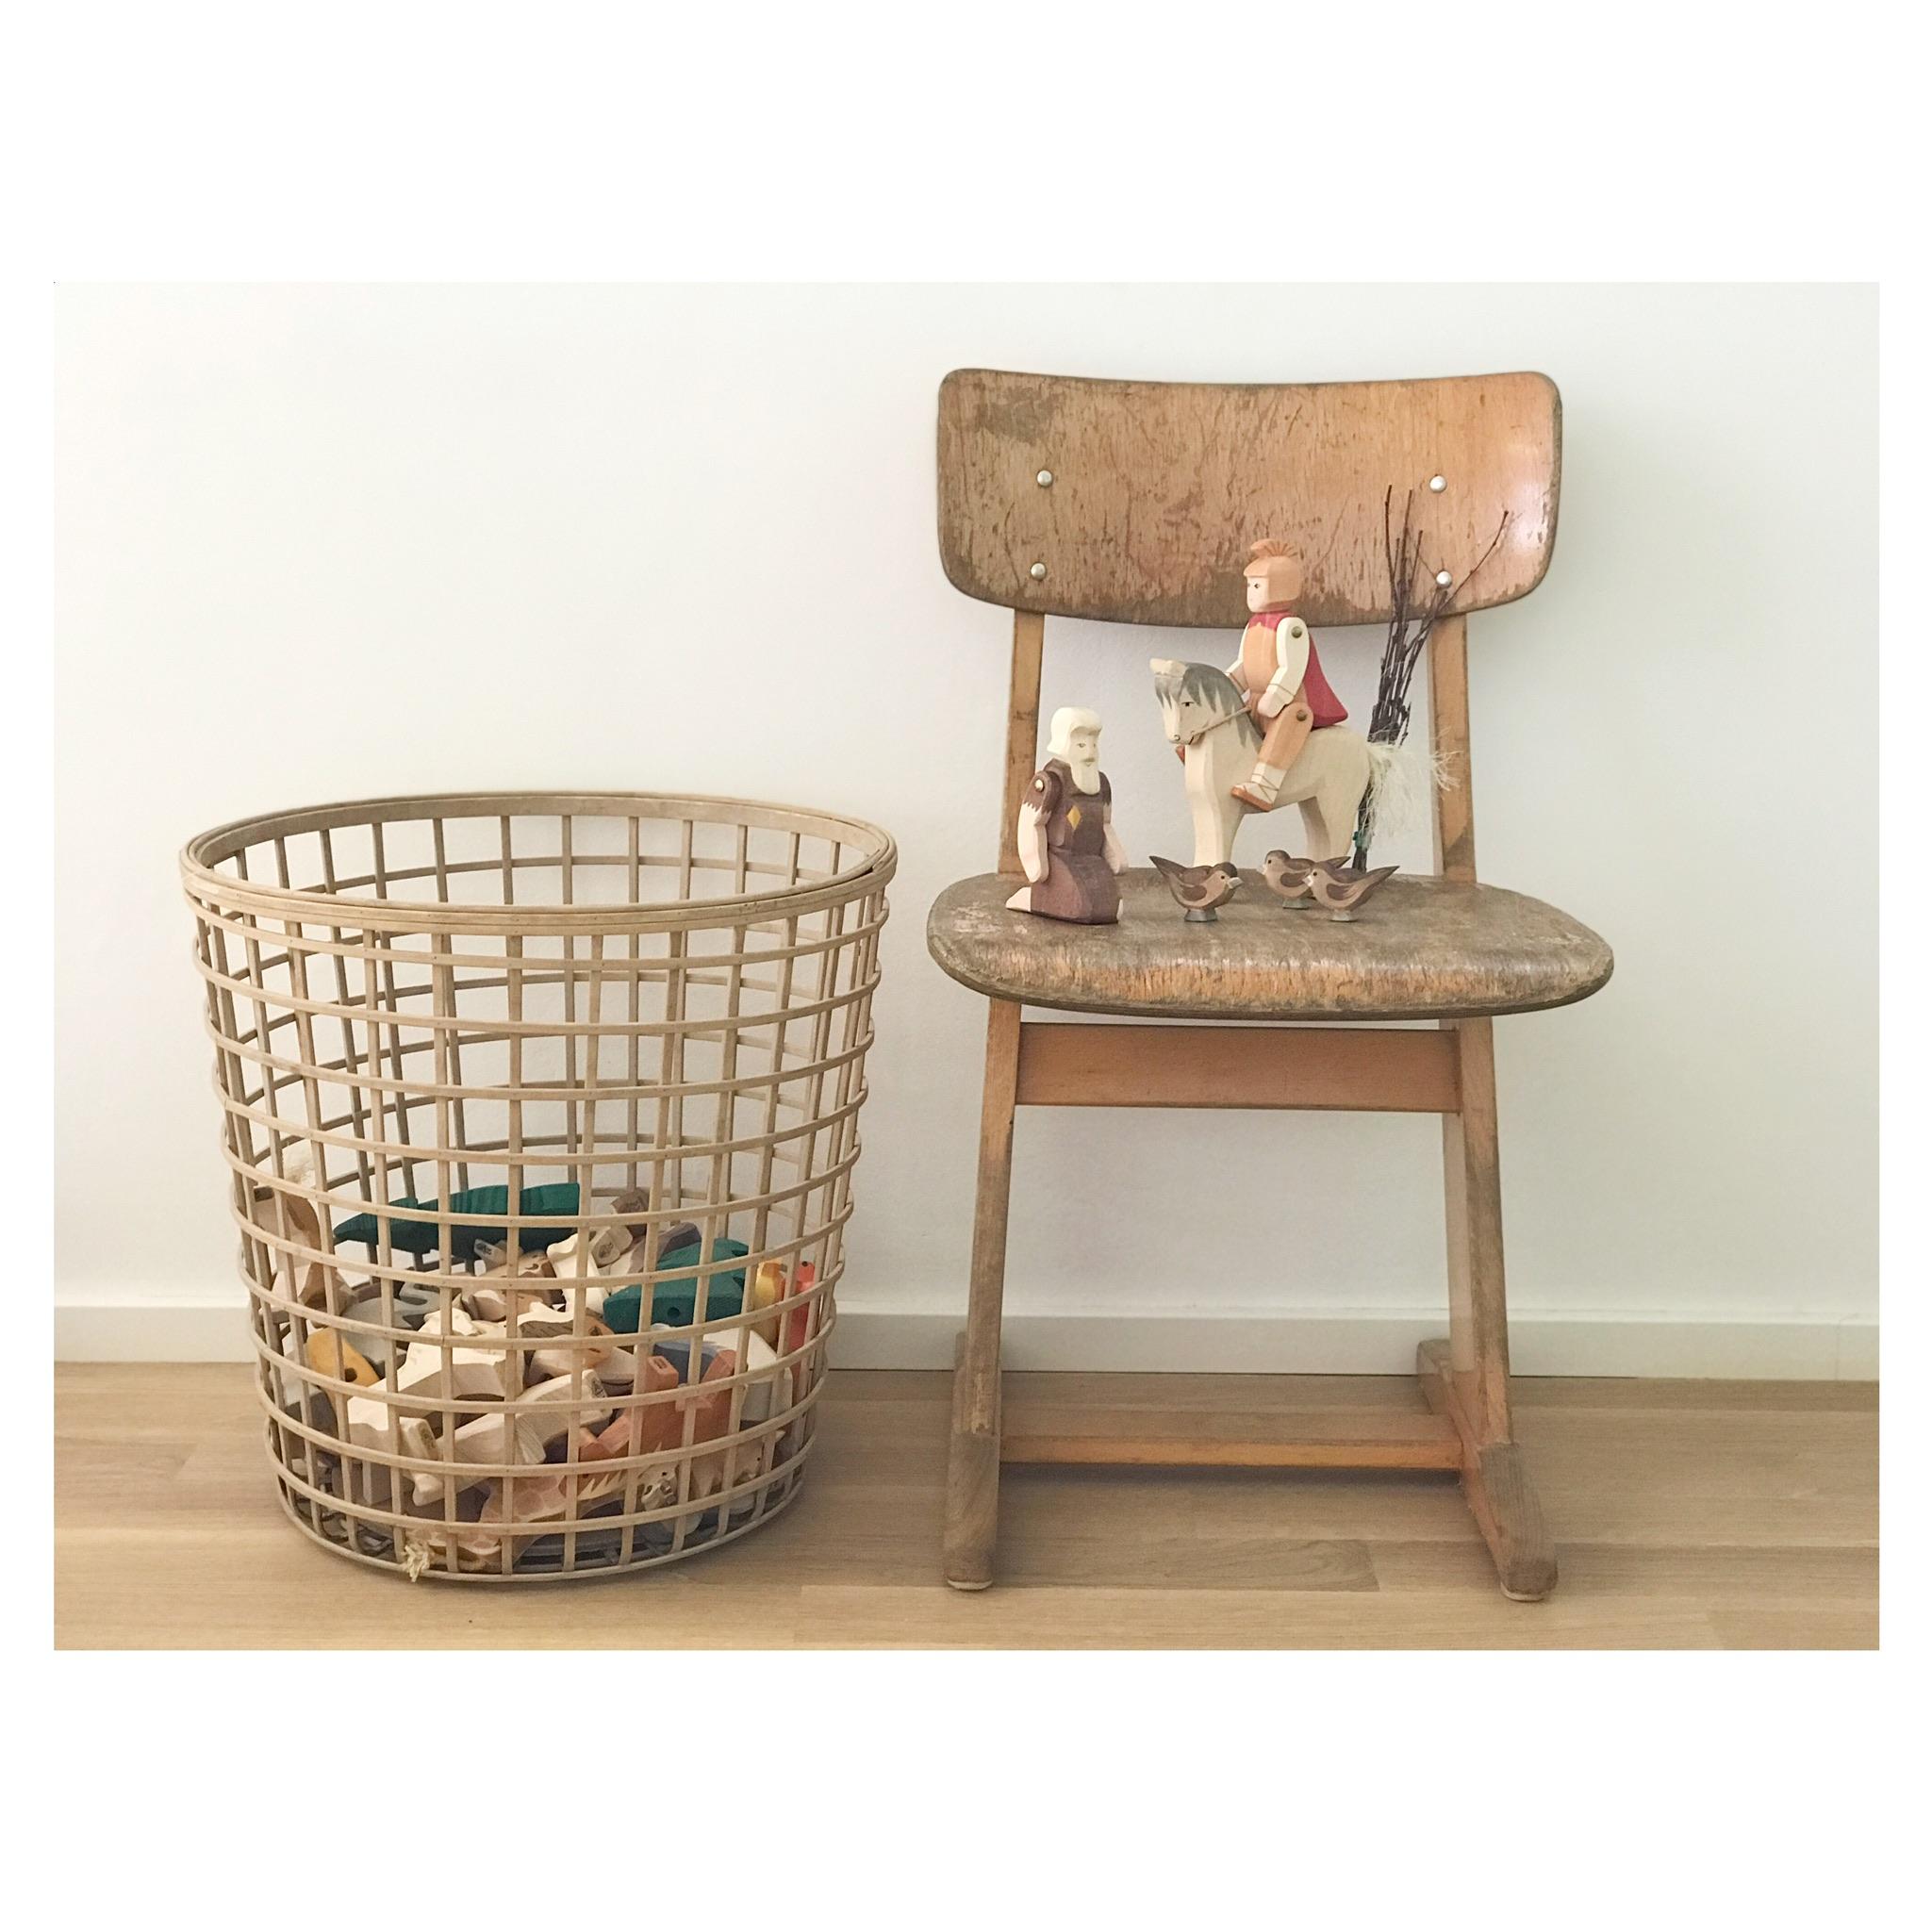 st martin ideen f r kleine und gro e kinder mamablog shop by elfenkind. Black Bedroom Furniture Sets. Home Design Ideas